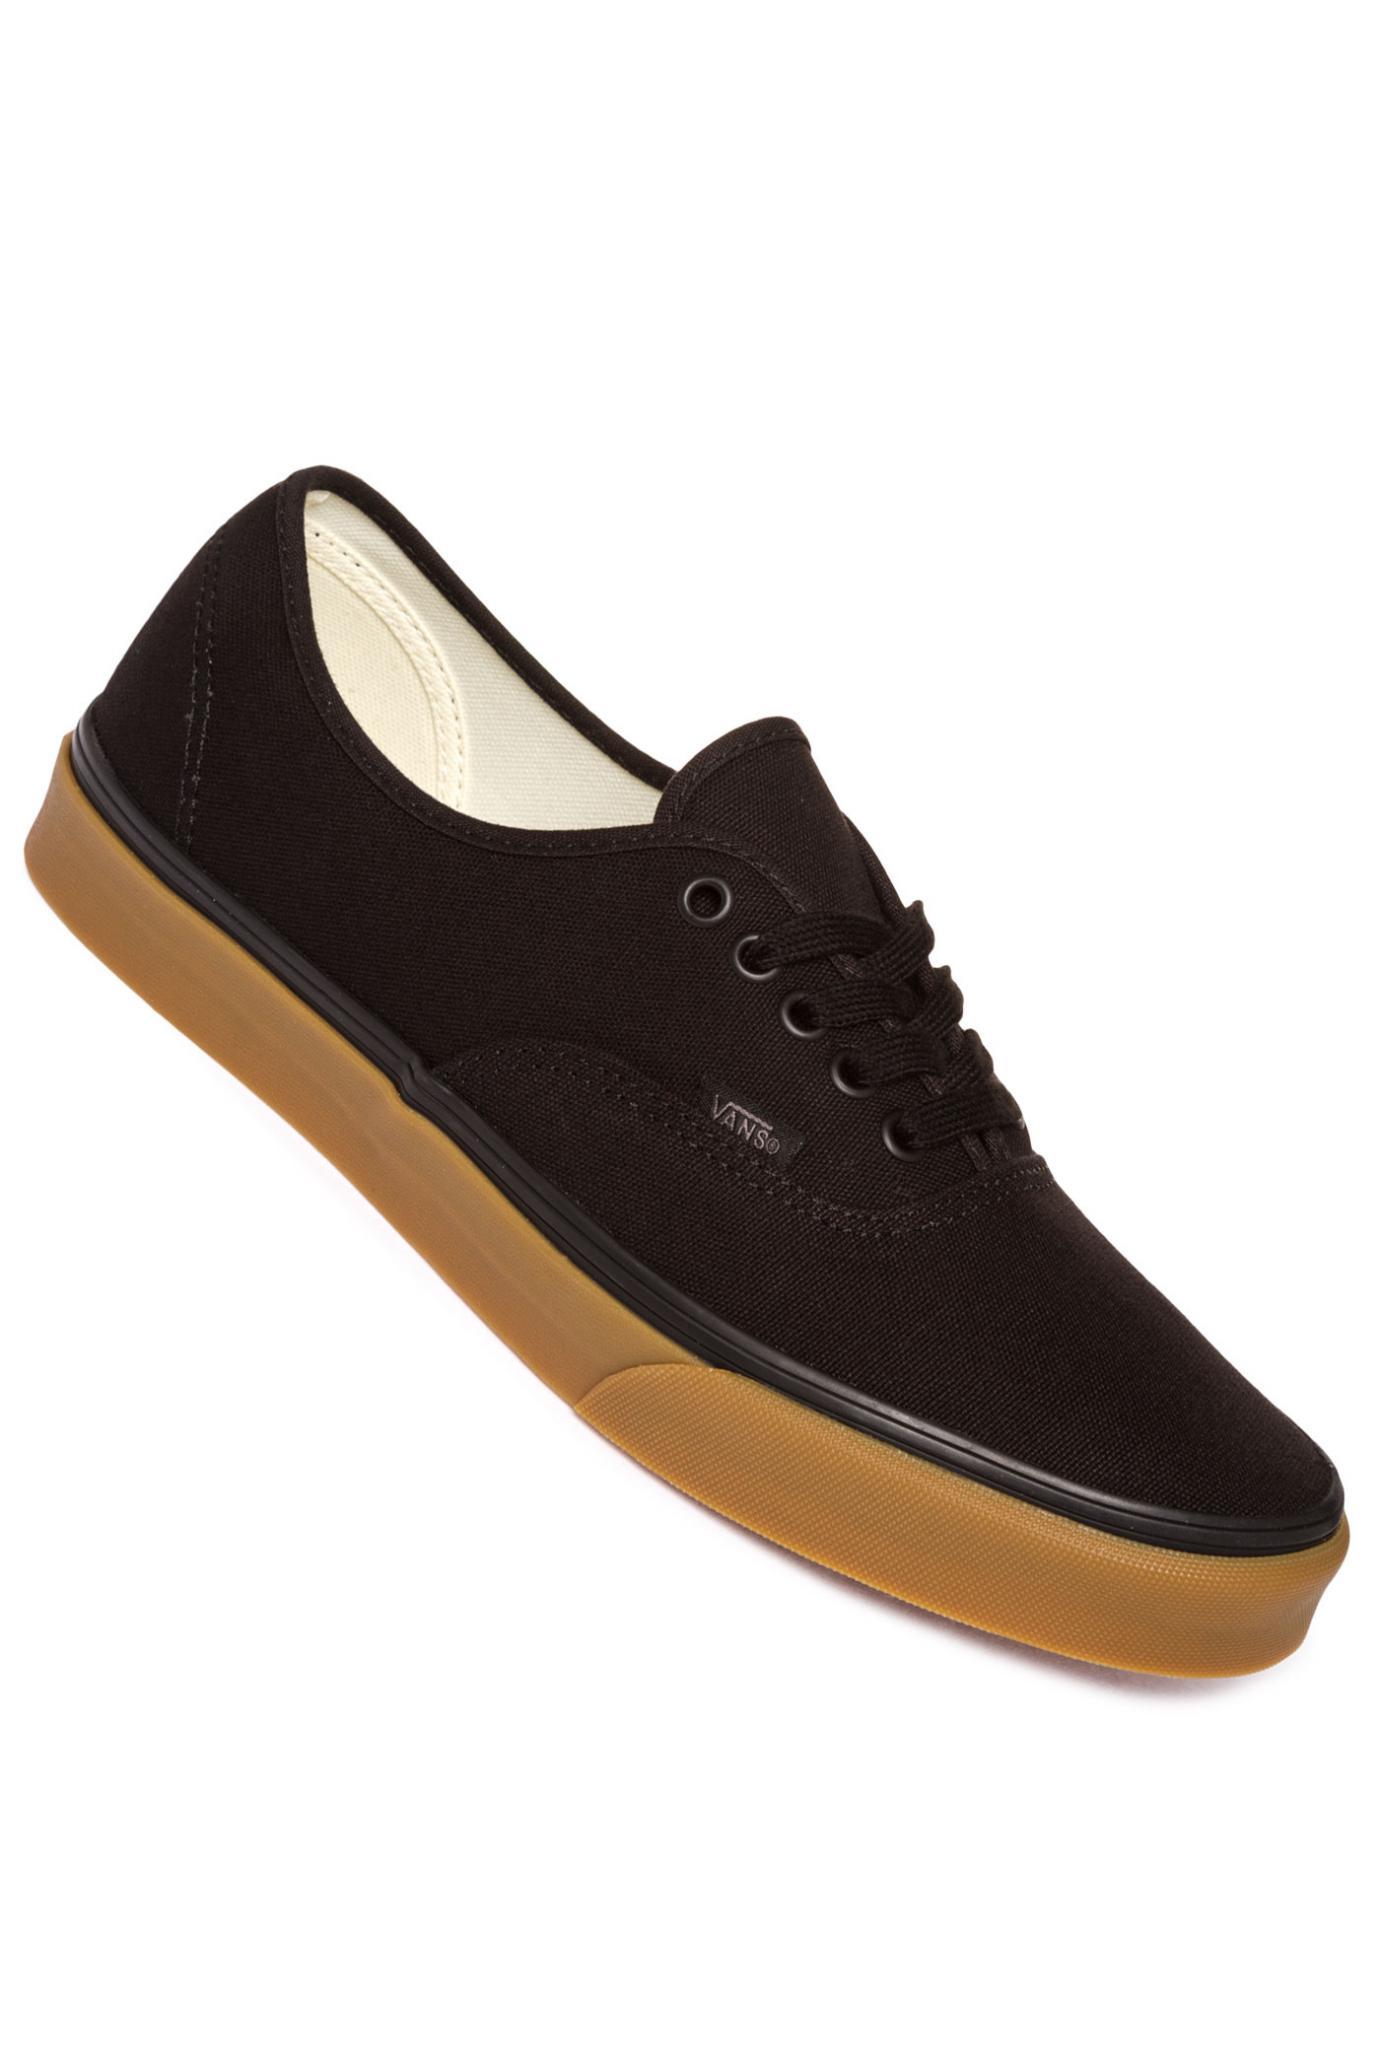 Sneaker | Authentic Canvas Scarpa 12 Oz Black Gum | Vans Uomo ⋆ Sport Vicenza